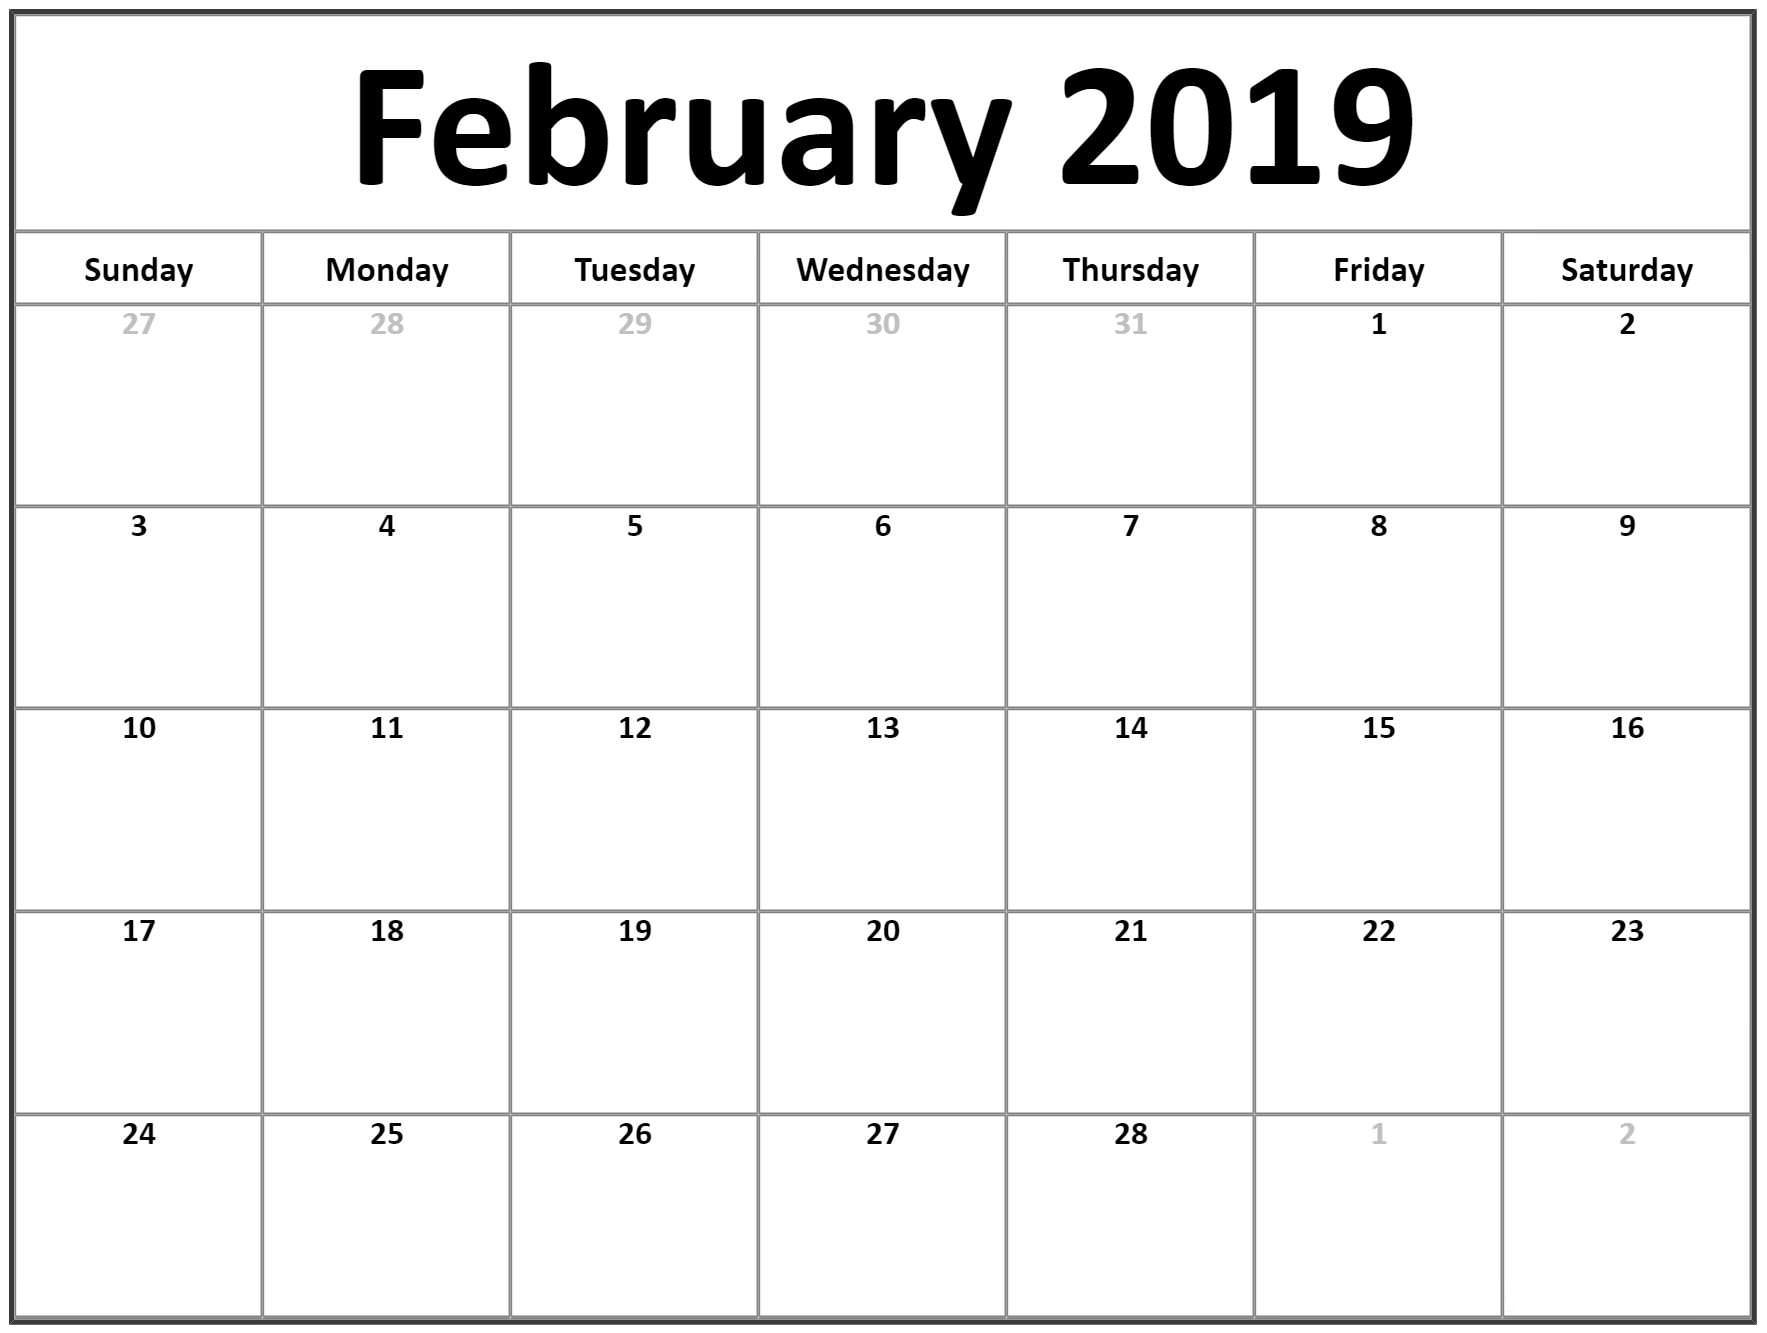 february 2019 calendar calendar template printable::February 2019 Calendar Template Printable